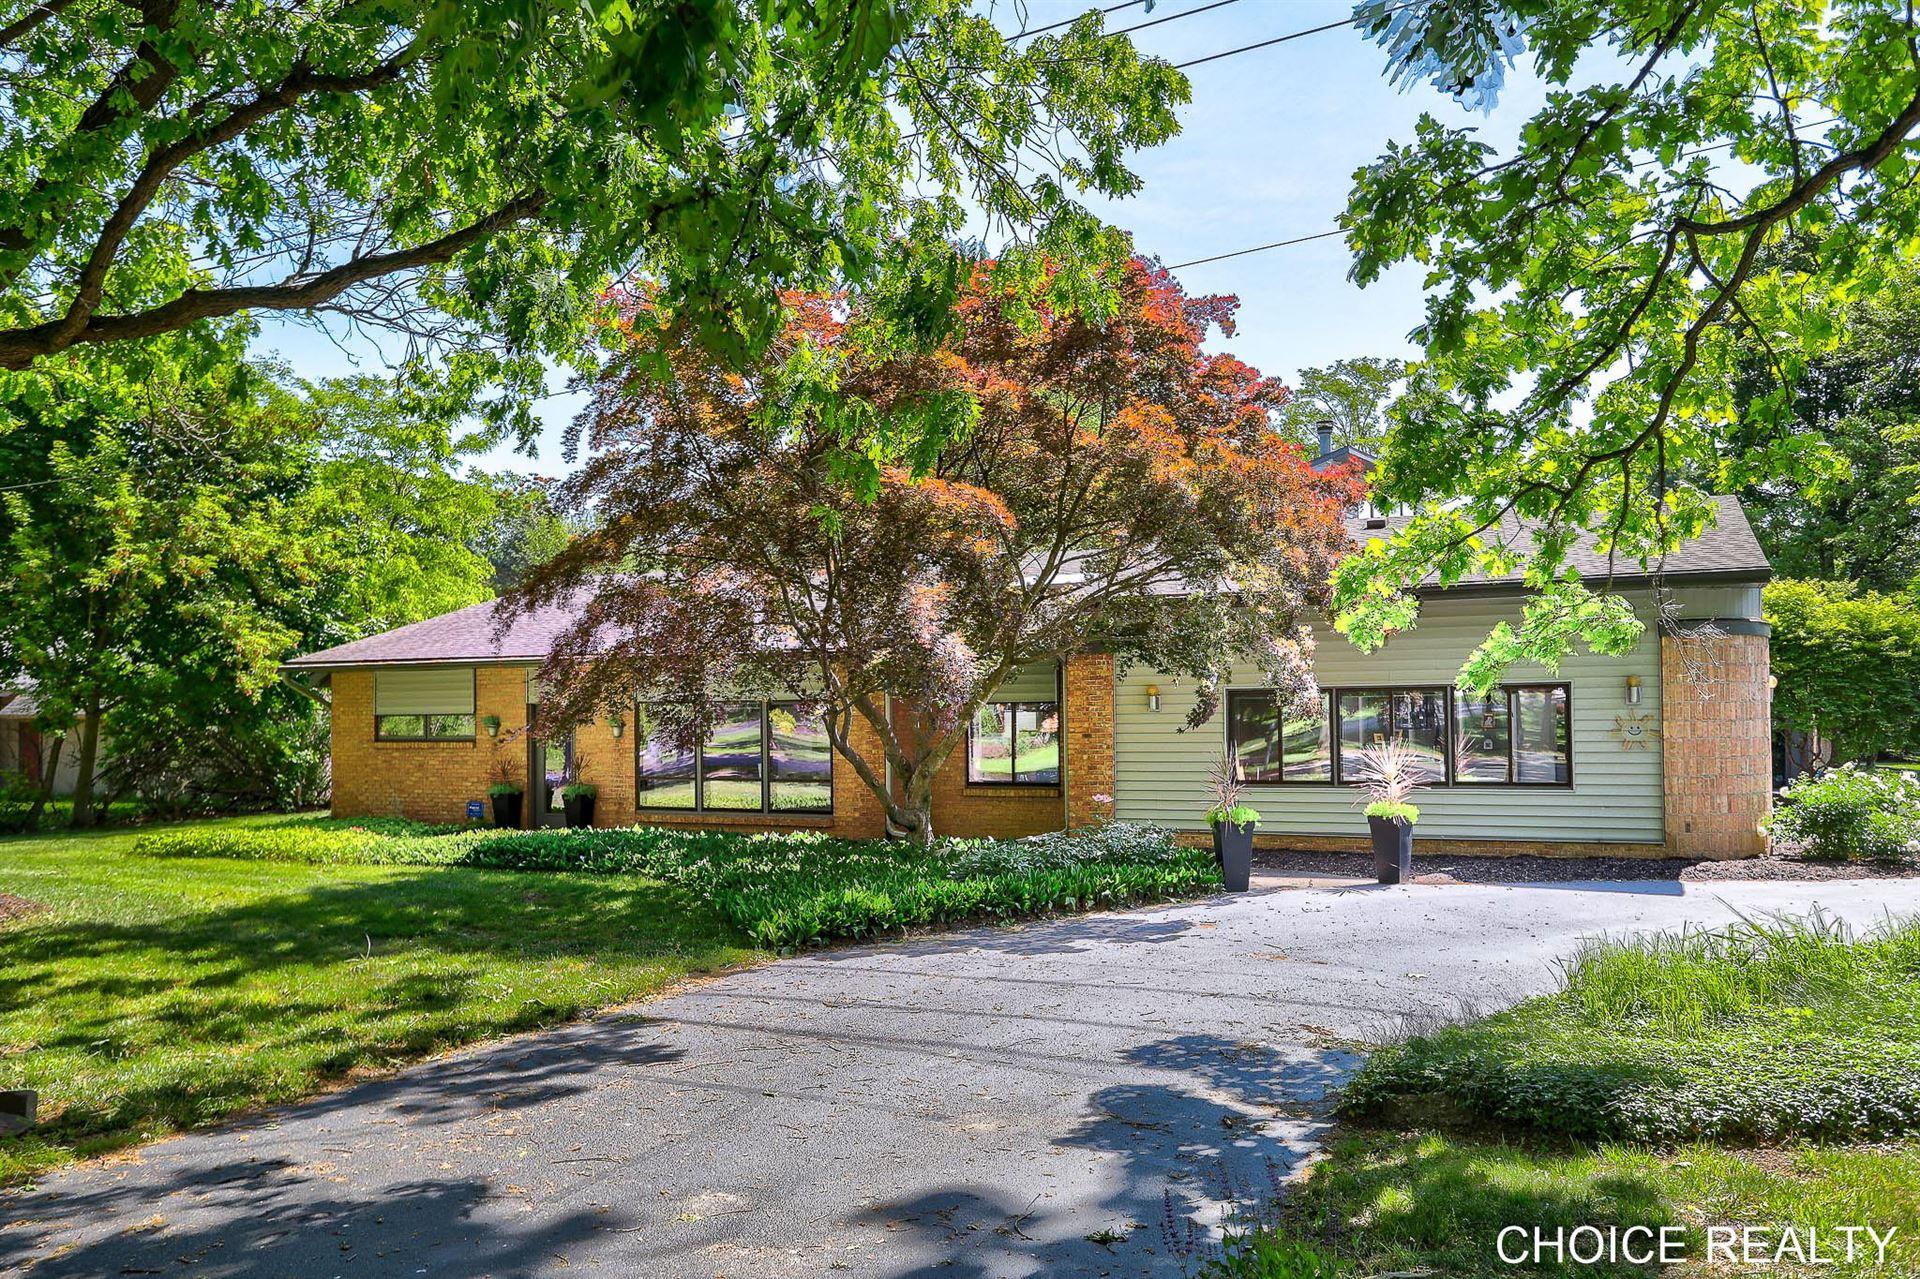 Photo of 1646 Thornapple River Drive SE, Grand Rapids, MI 49546 (MLS # 21010147)